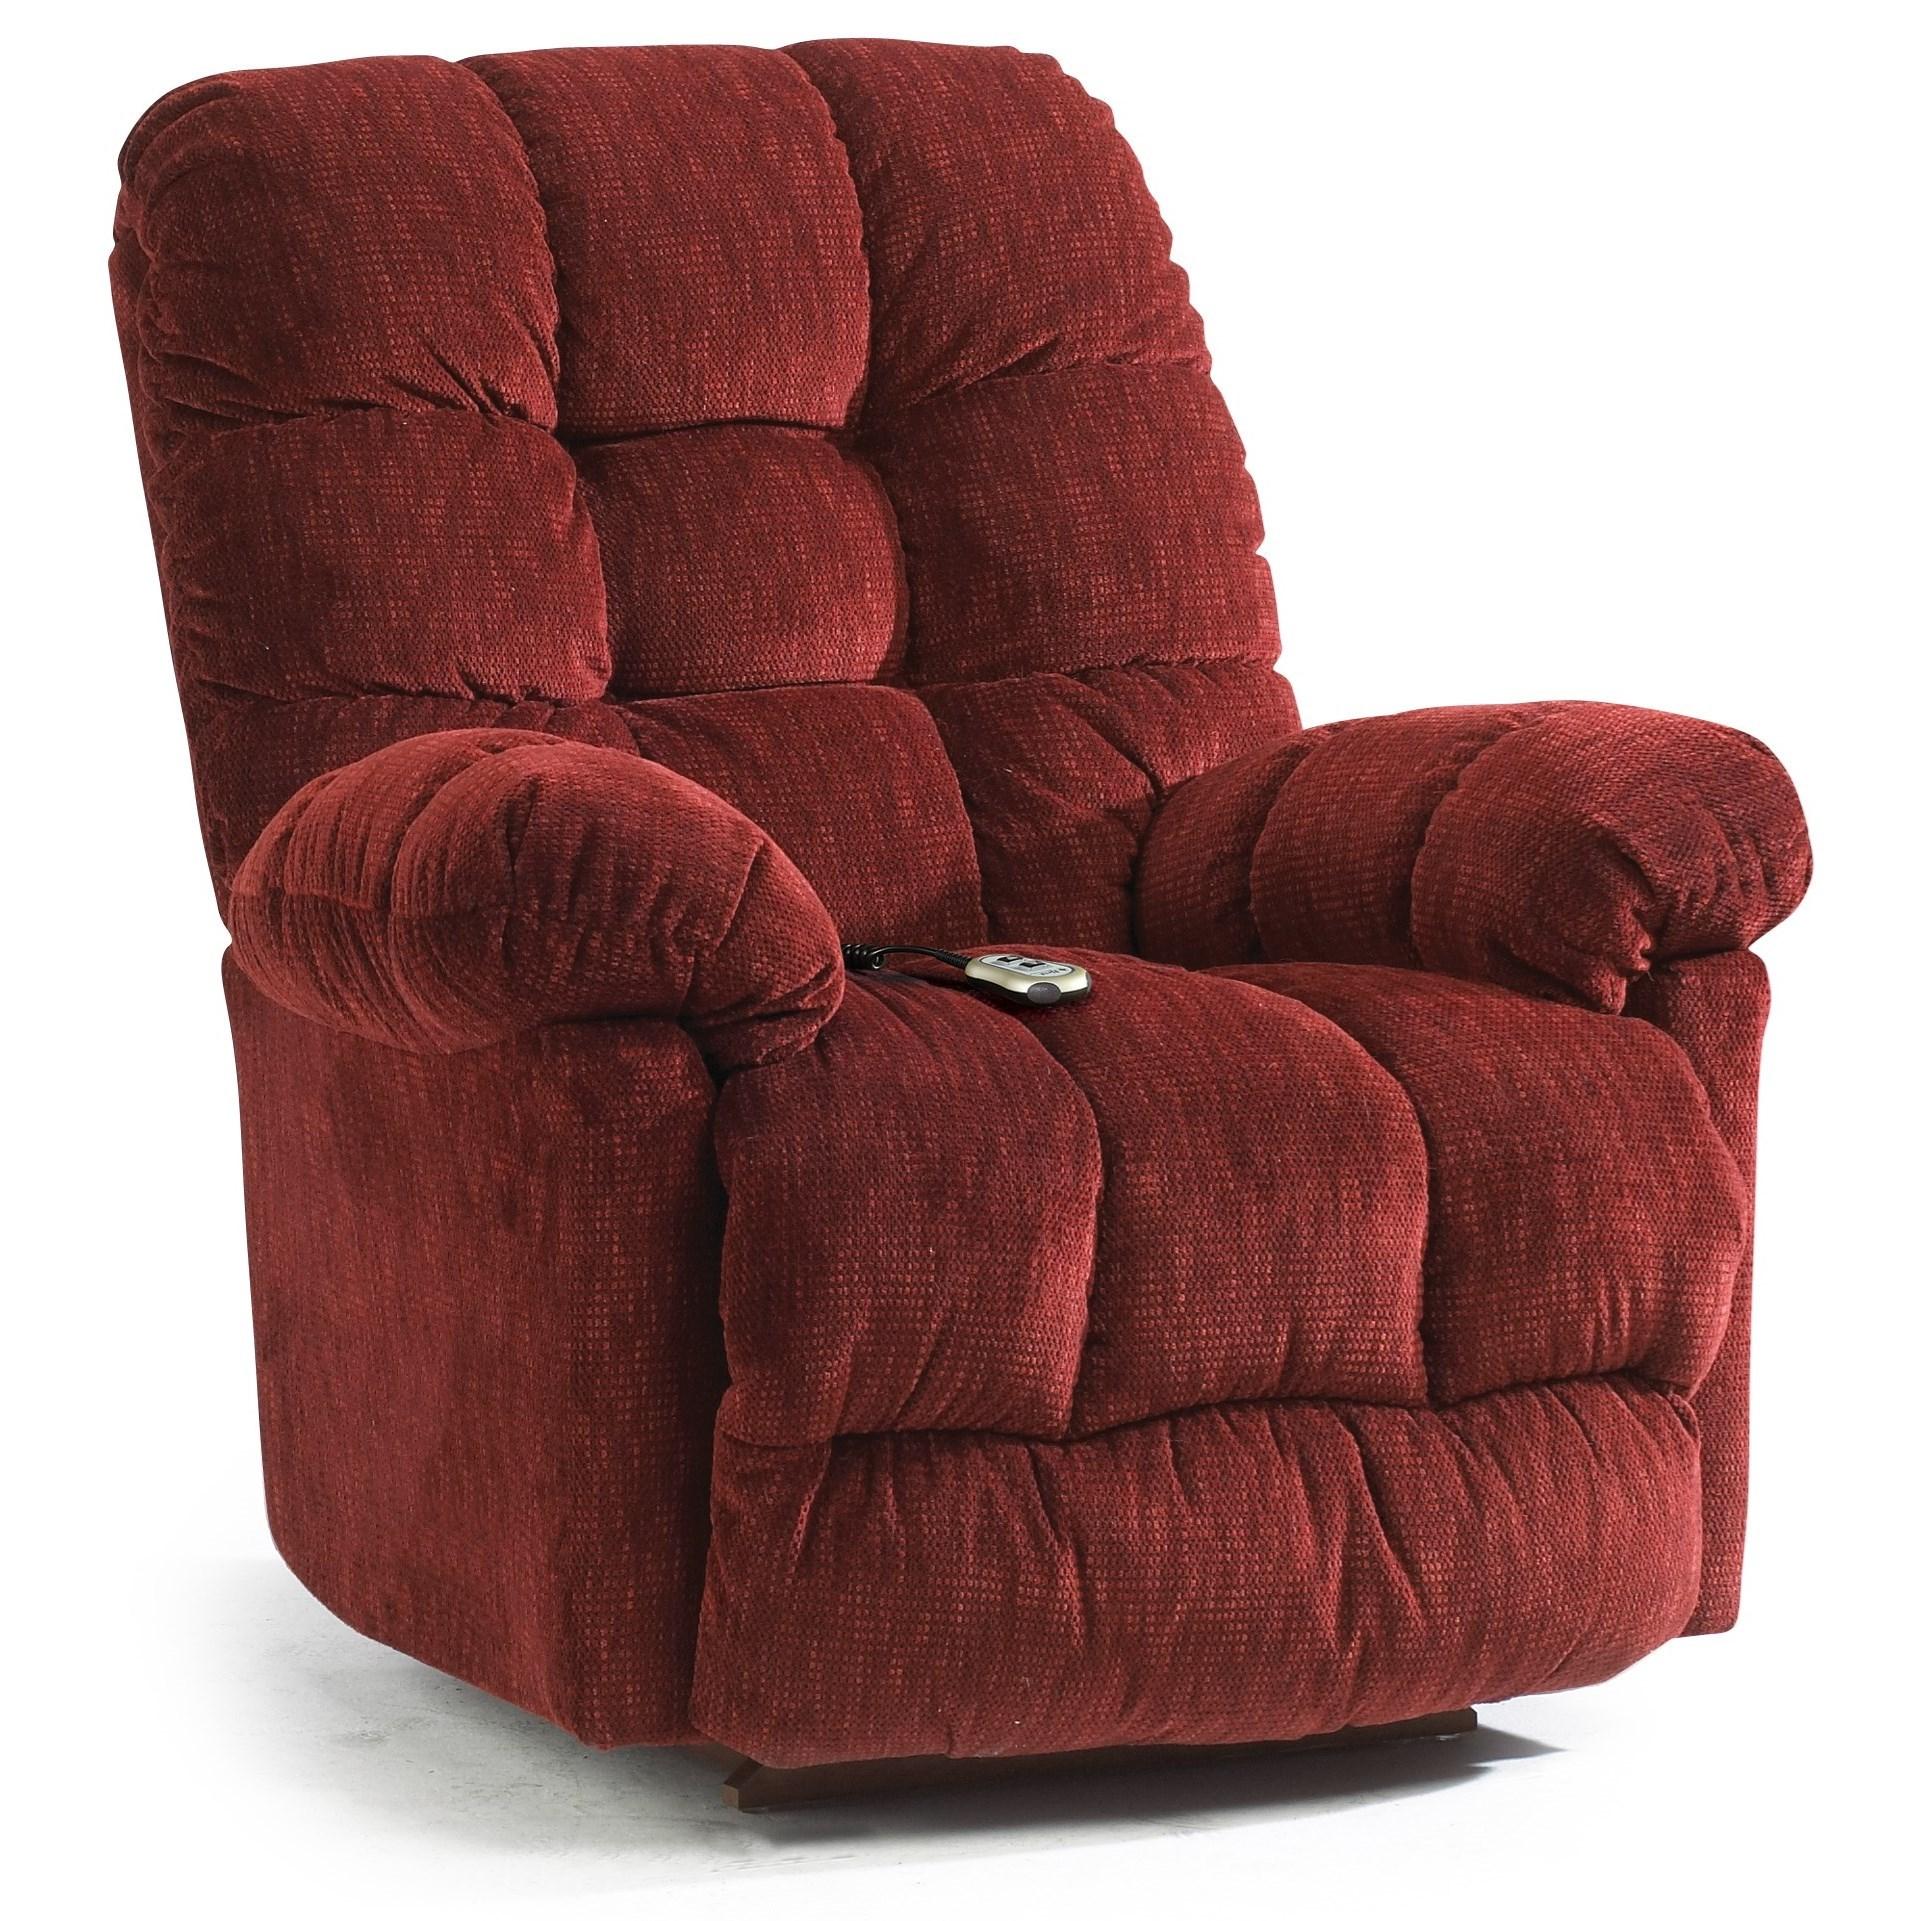 Best Home Furnishings Recliners - Medium Power Rocker Recliner w/ Pwr Headrest  - Item Number: 9MZ87-1